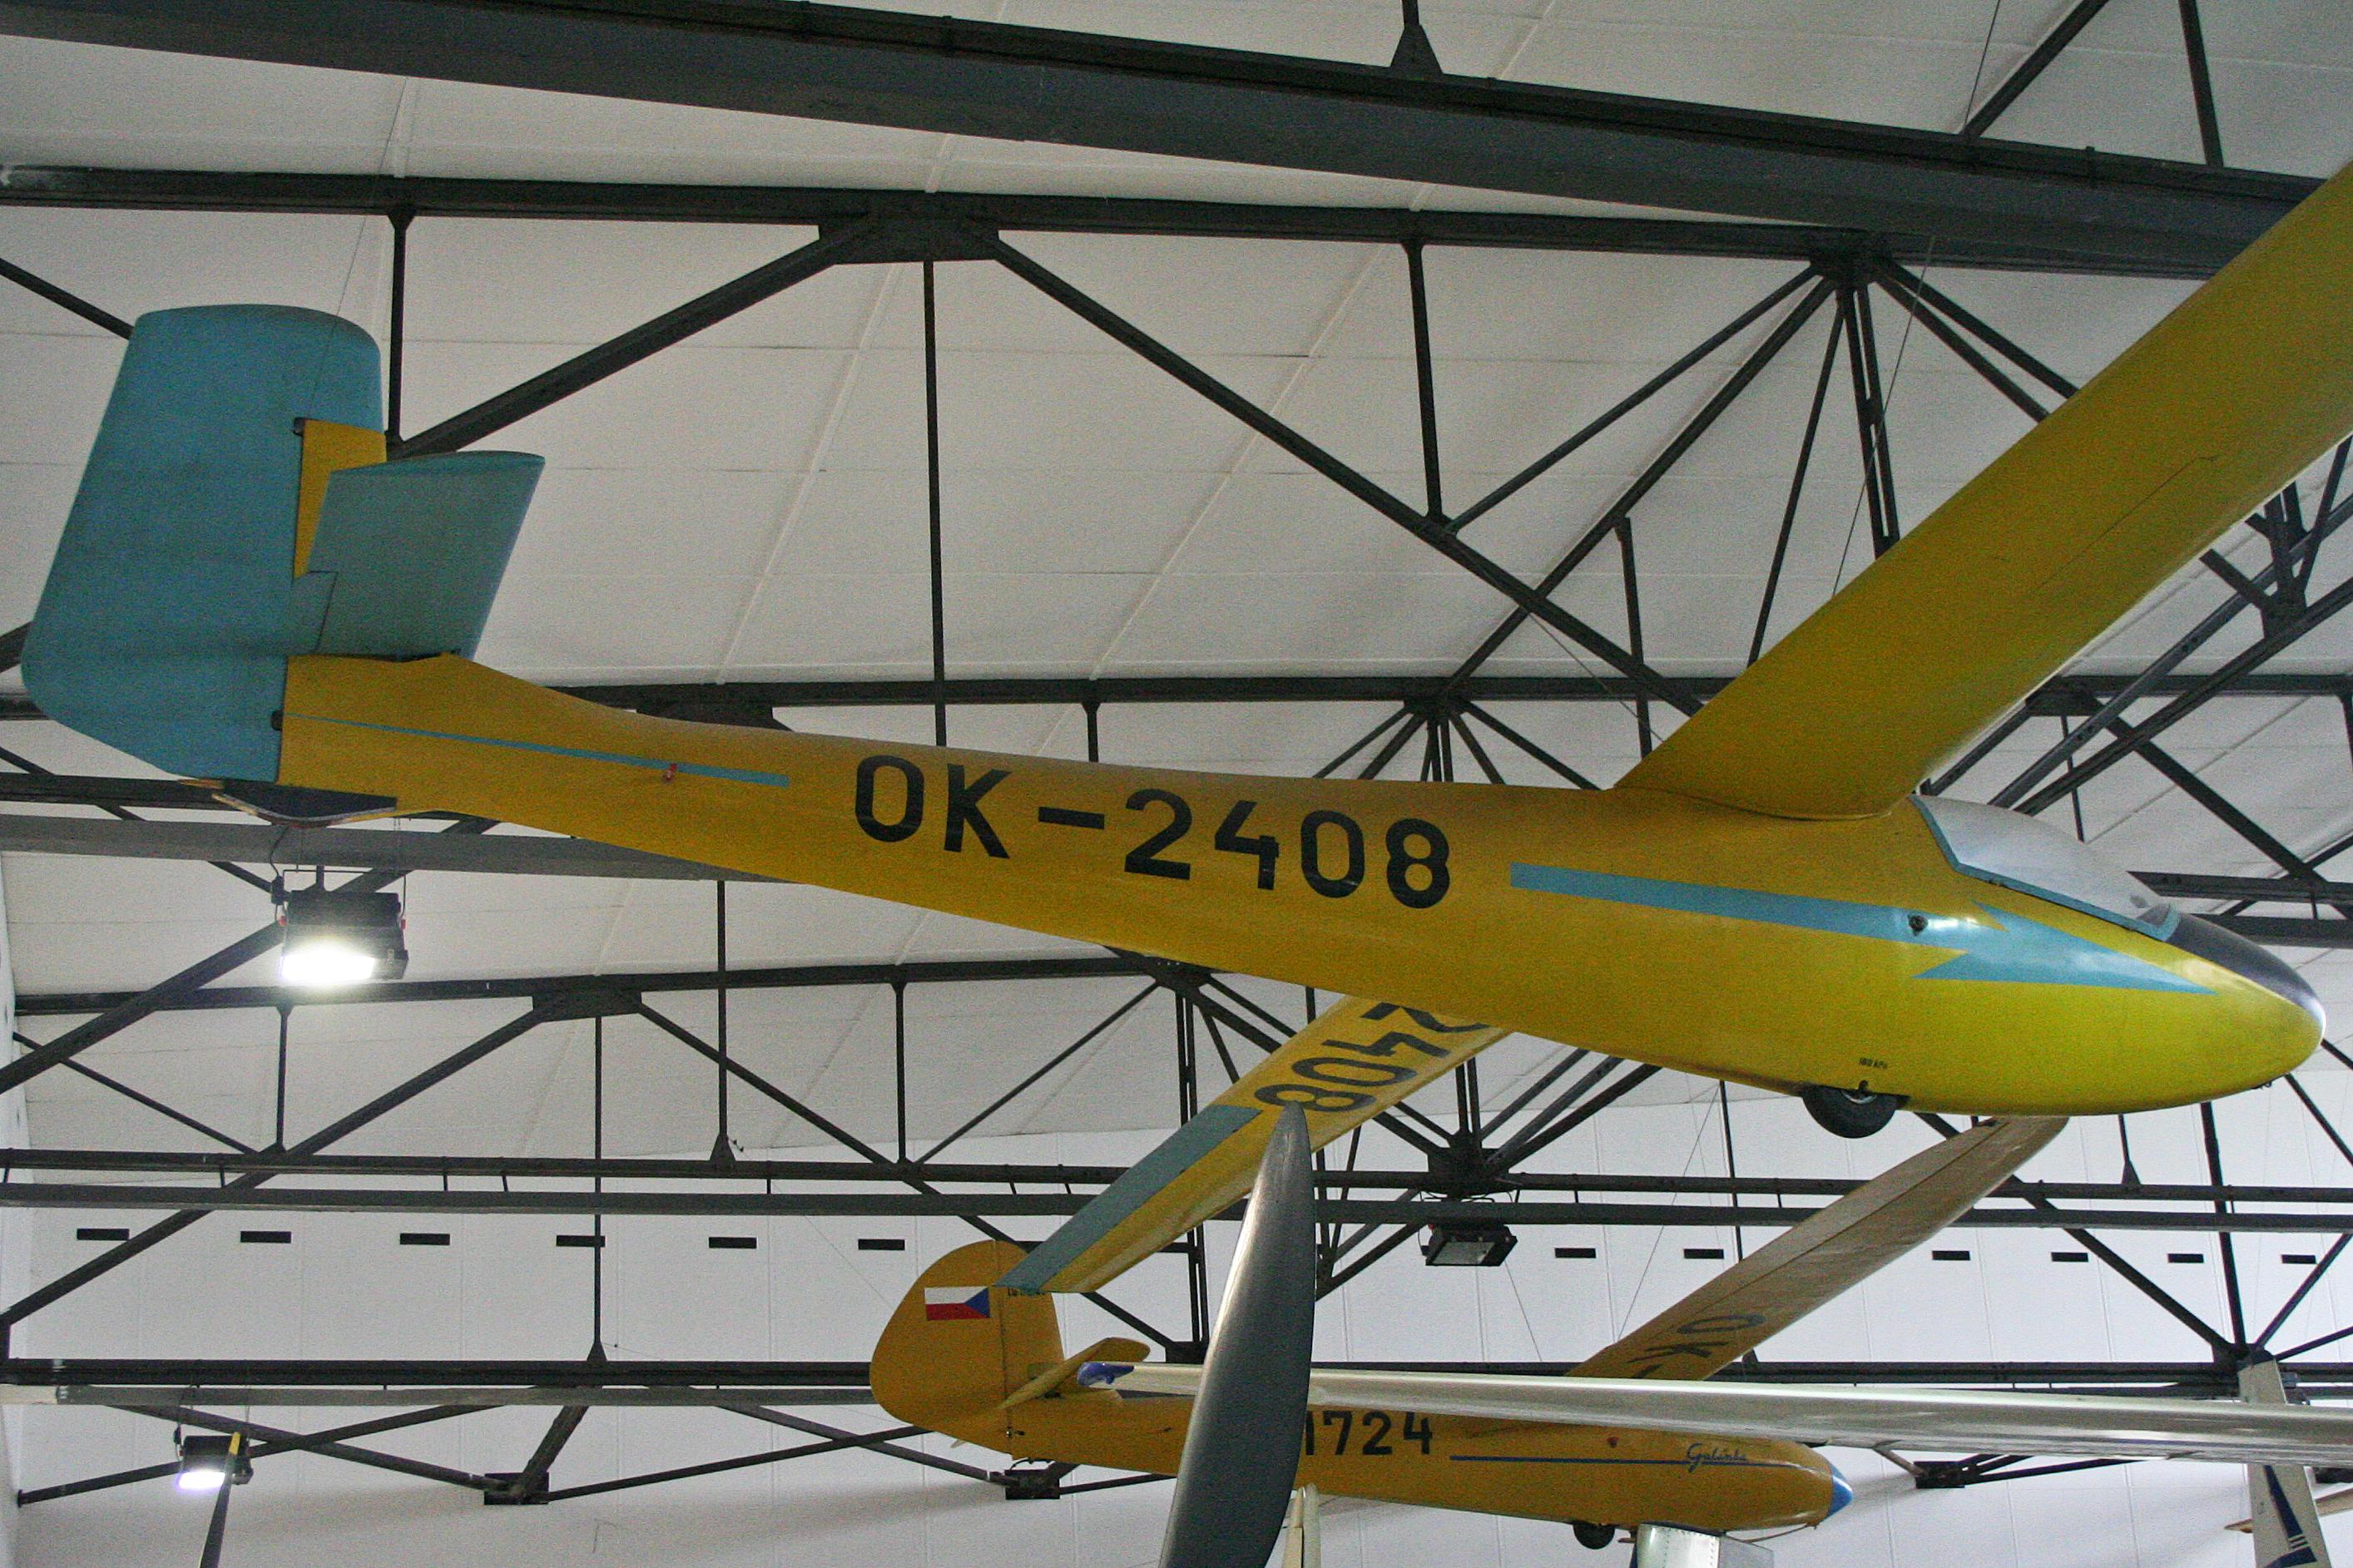 File:Orlican VT-16 Orlik 1 OK-2408 (8255251749).jpg